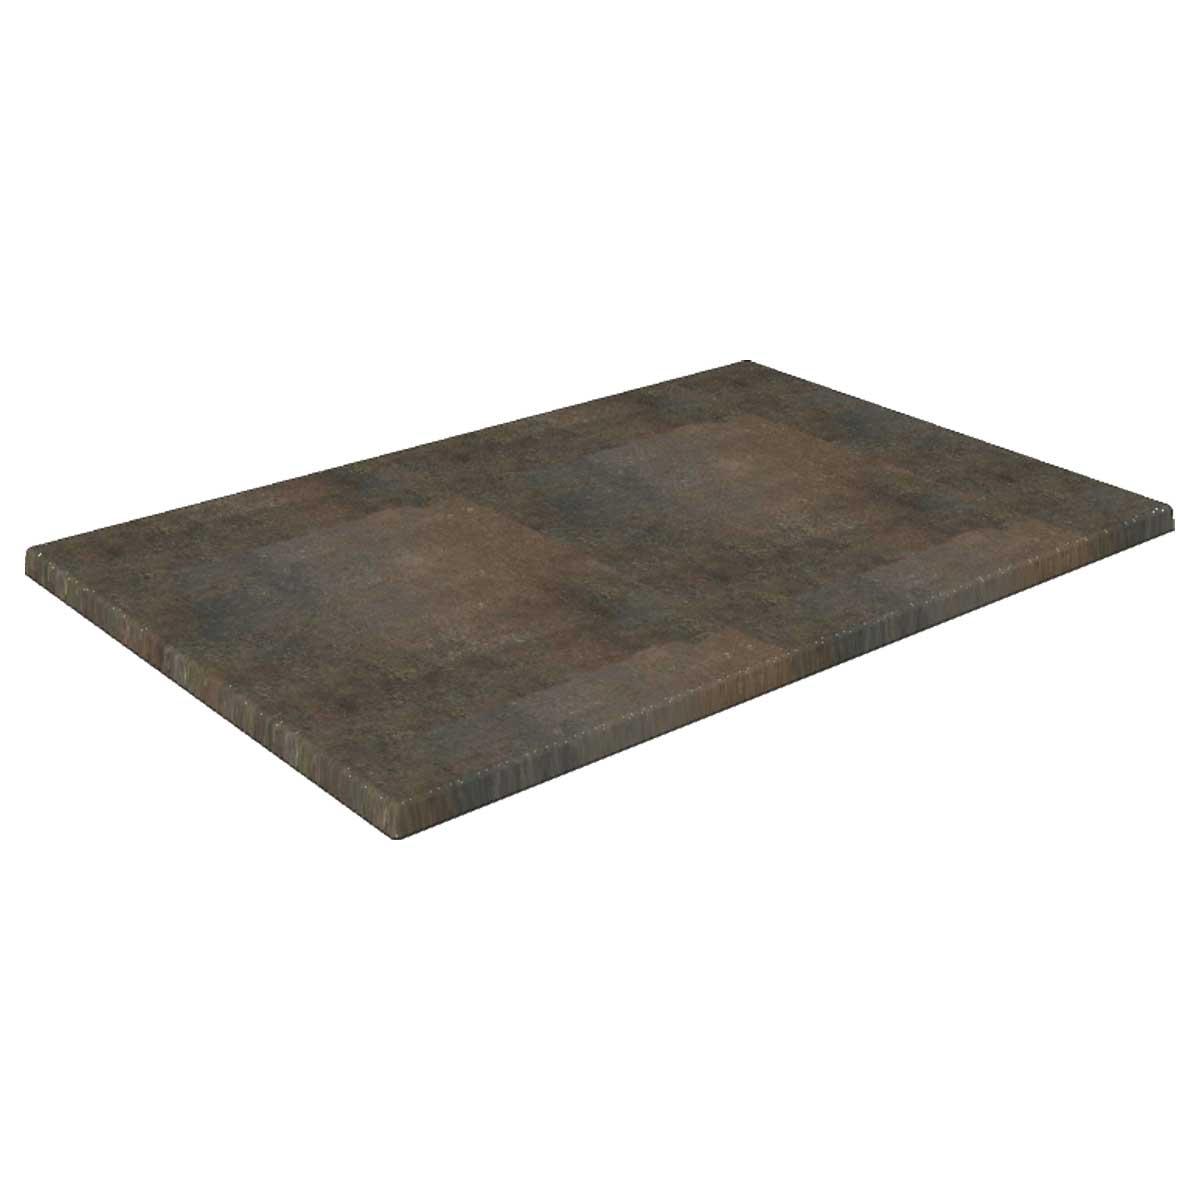 TICLA E120X80 083 - https://www.werzalit.com/fr/produit/plateau-de-table-classic-werzalit-e-80x60-083-factory/